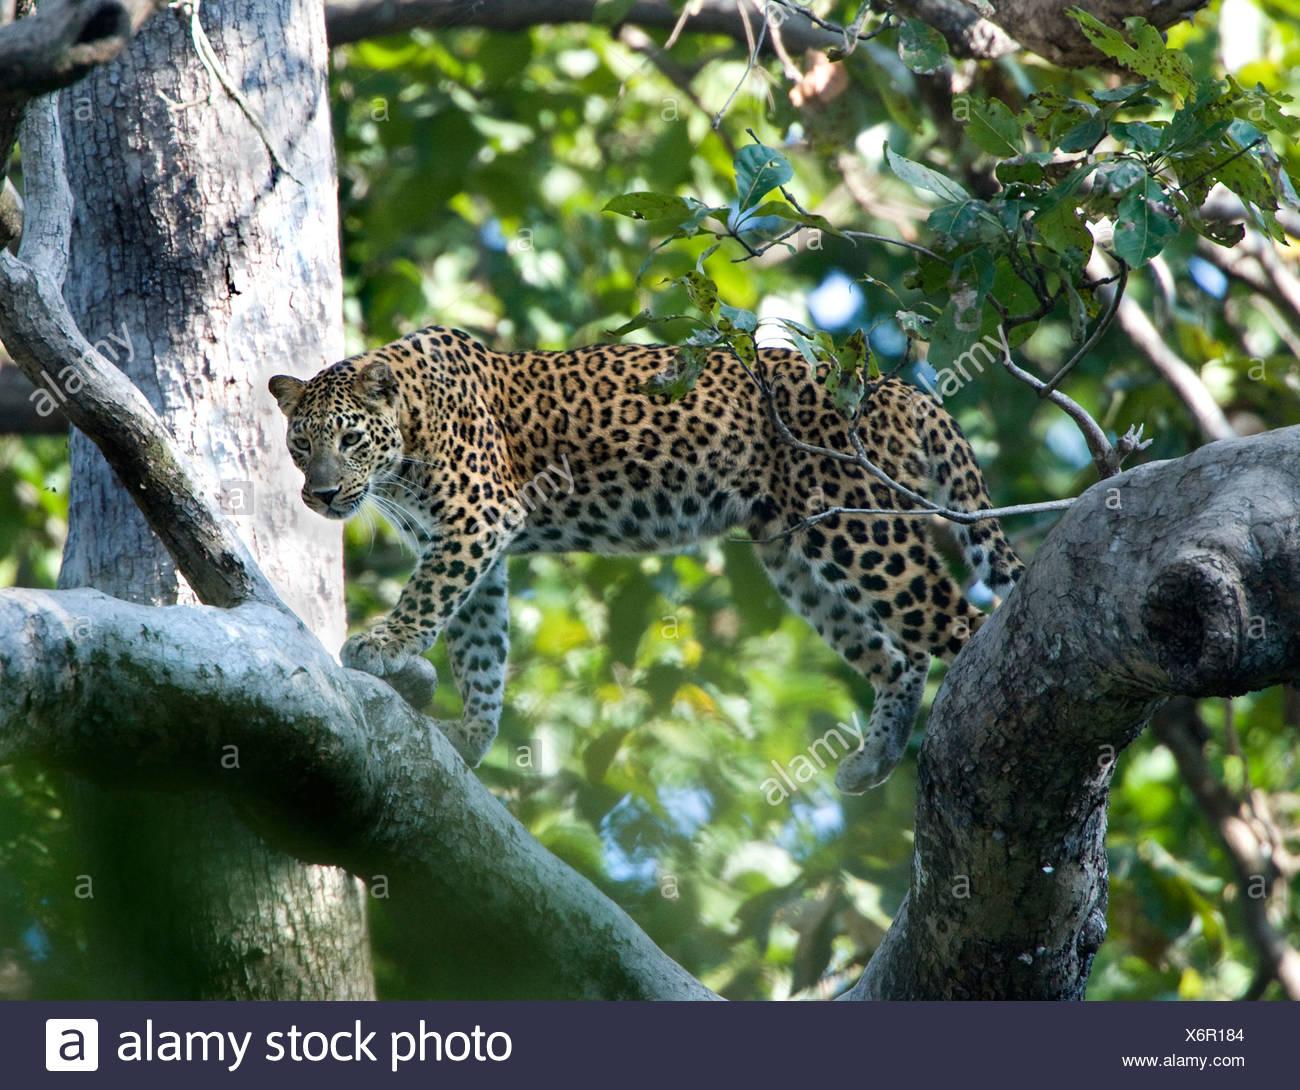 Asiatischen Leoparden Panthera Pardus Wandern Ast Stockbild